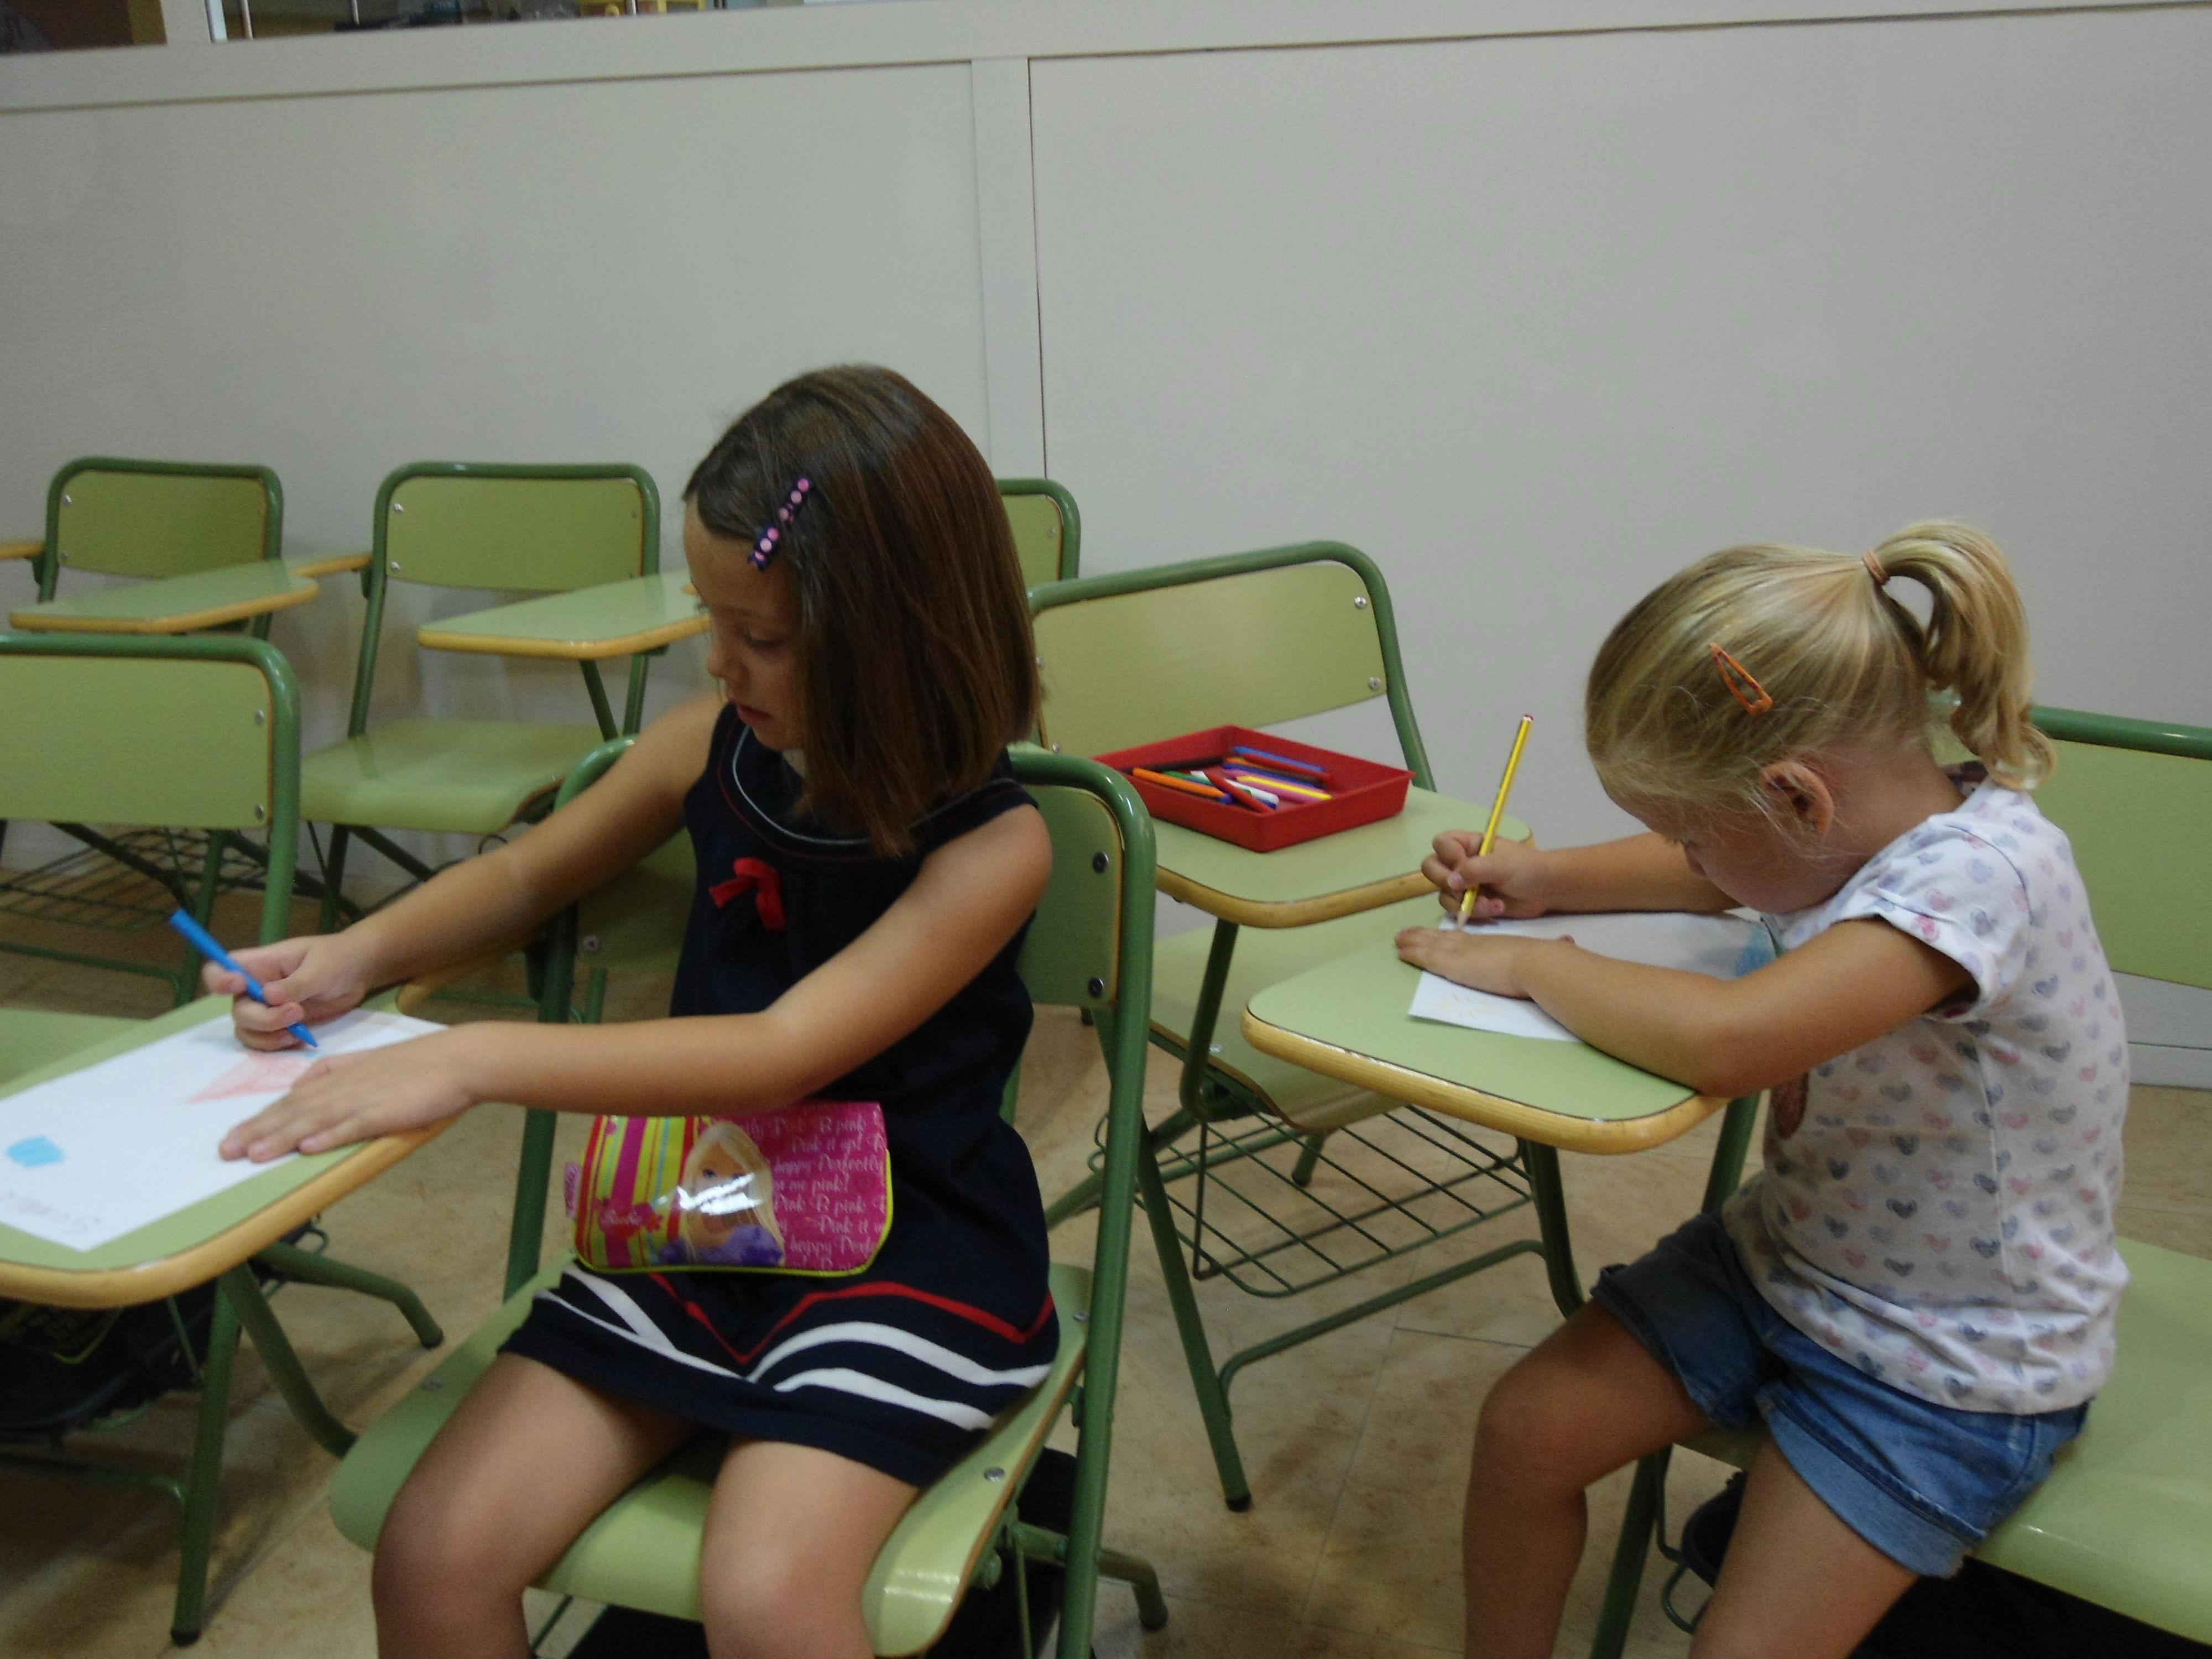 Foto 41 de Academias de idiomas en Moncada | Centre d'Estudis Etnies